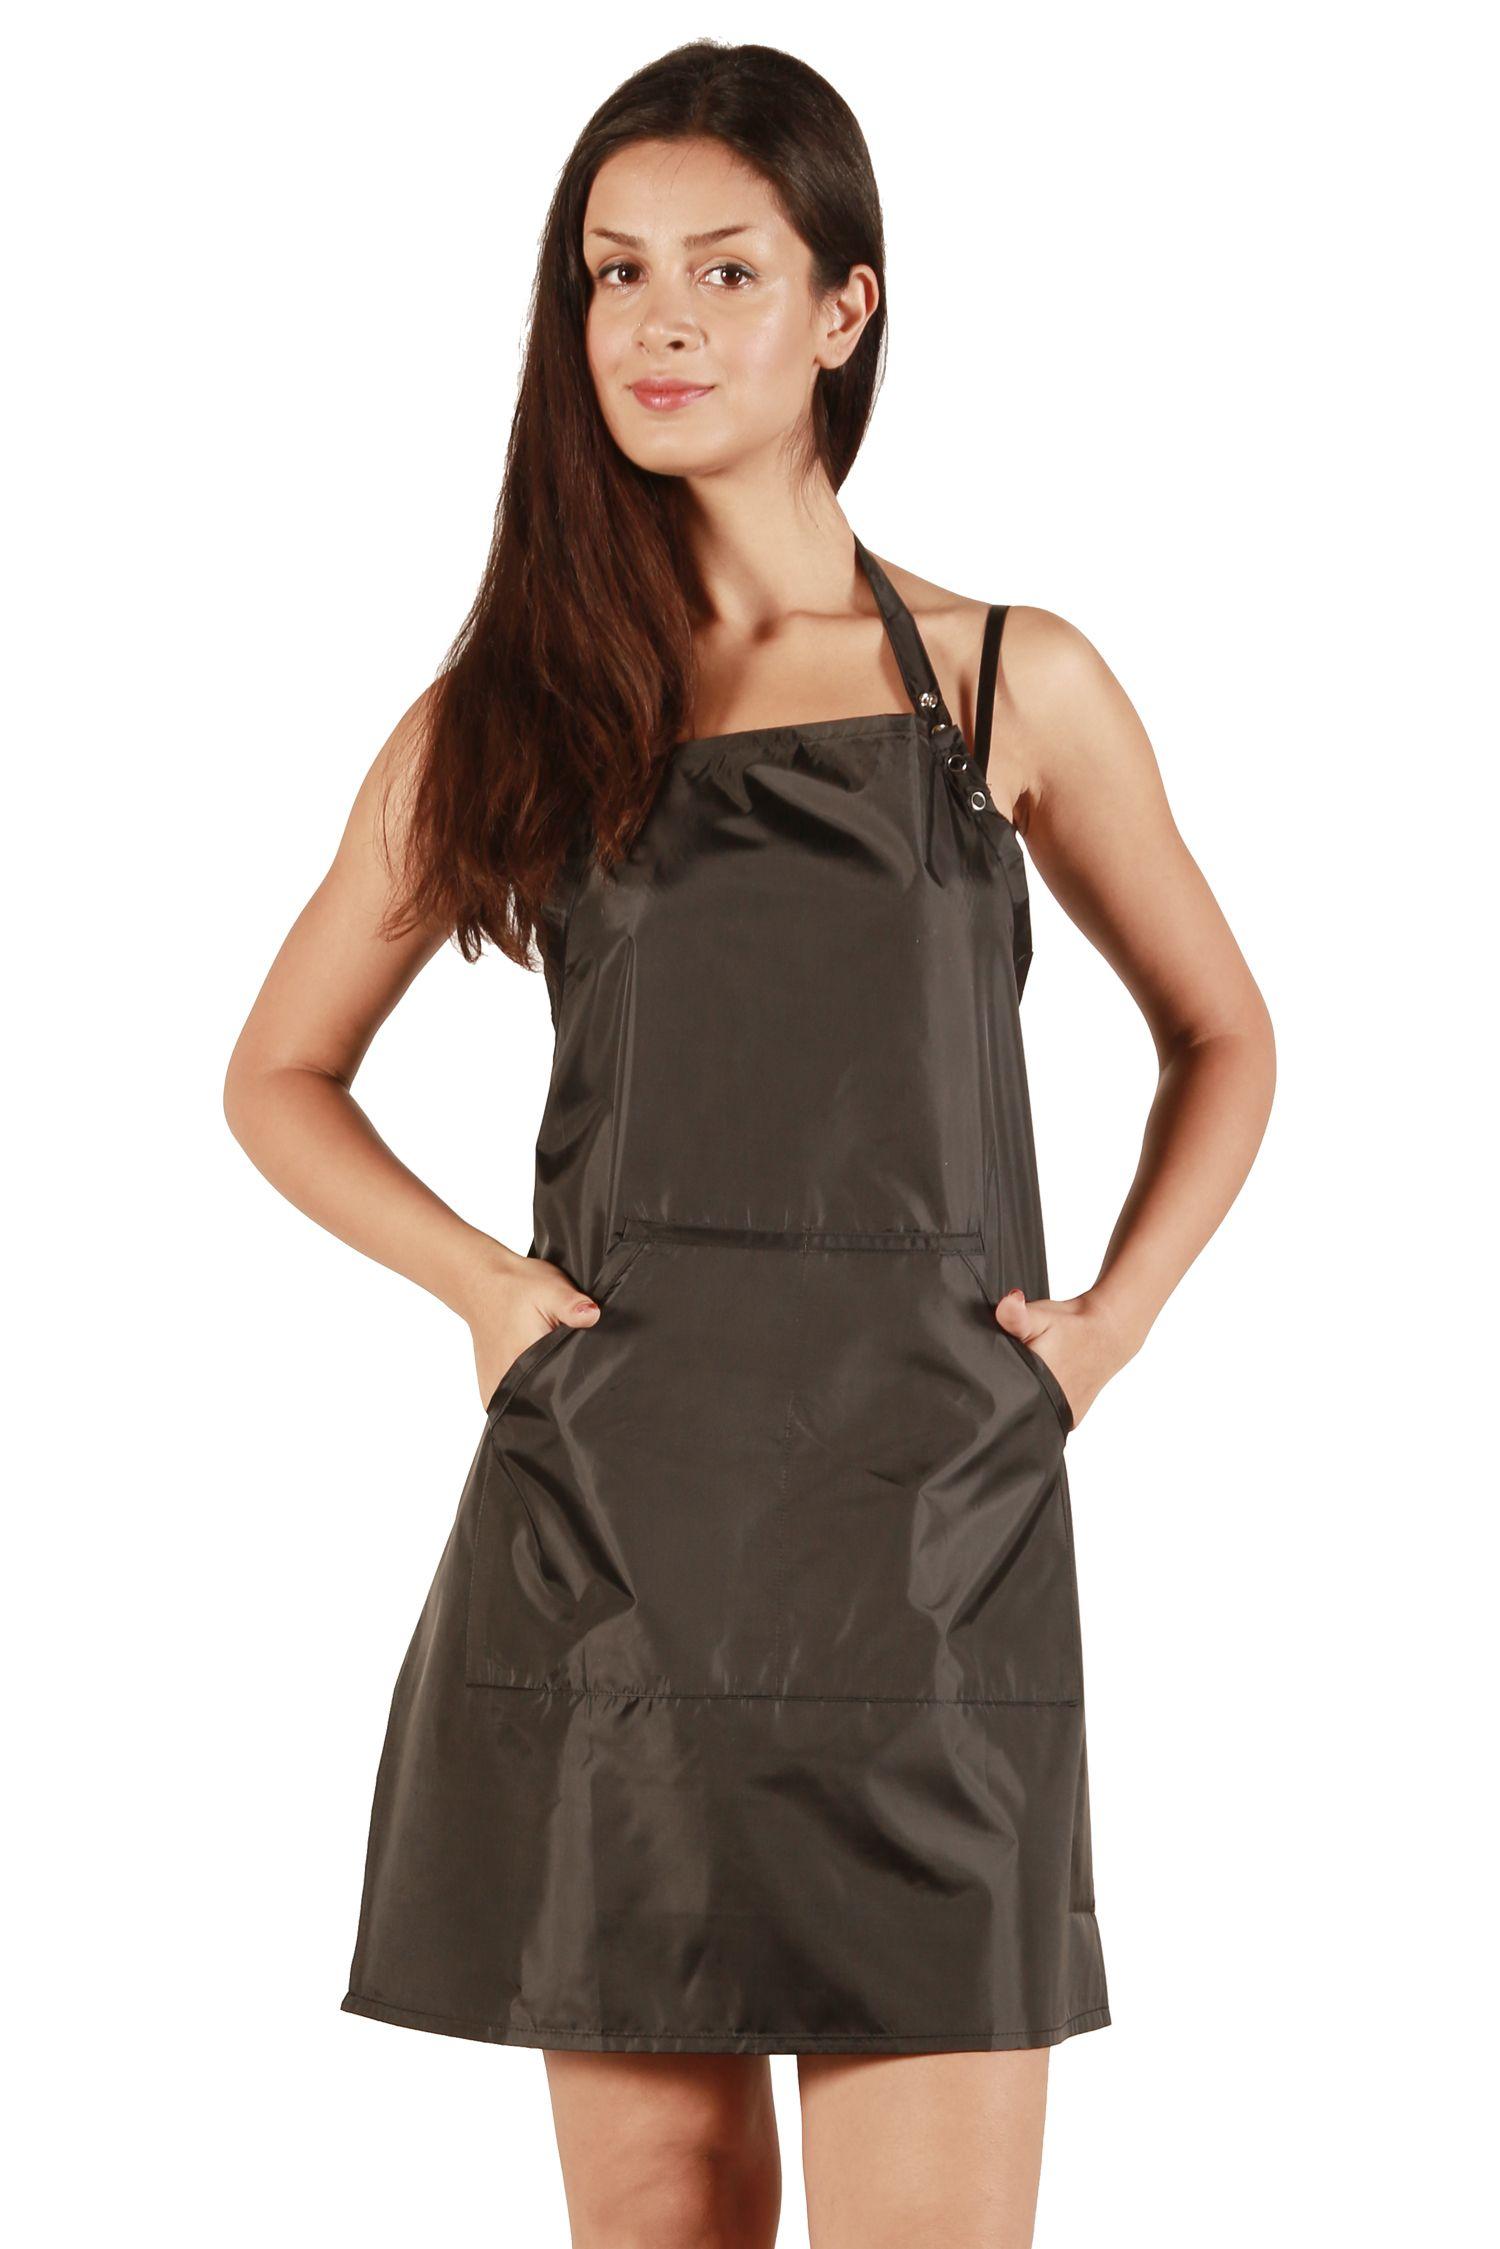 Waterproof Black Apron Black apron, Fashion, Stylists aprons